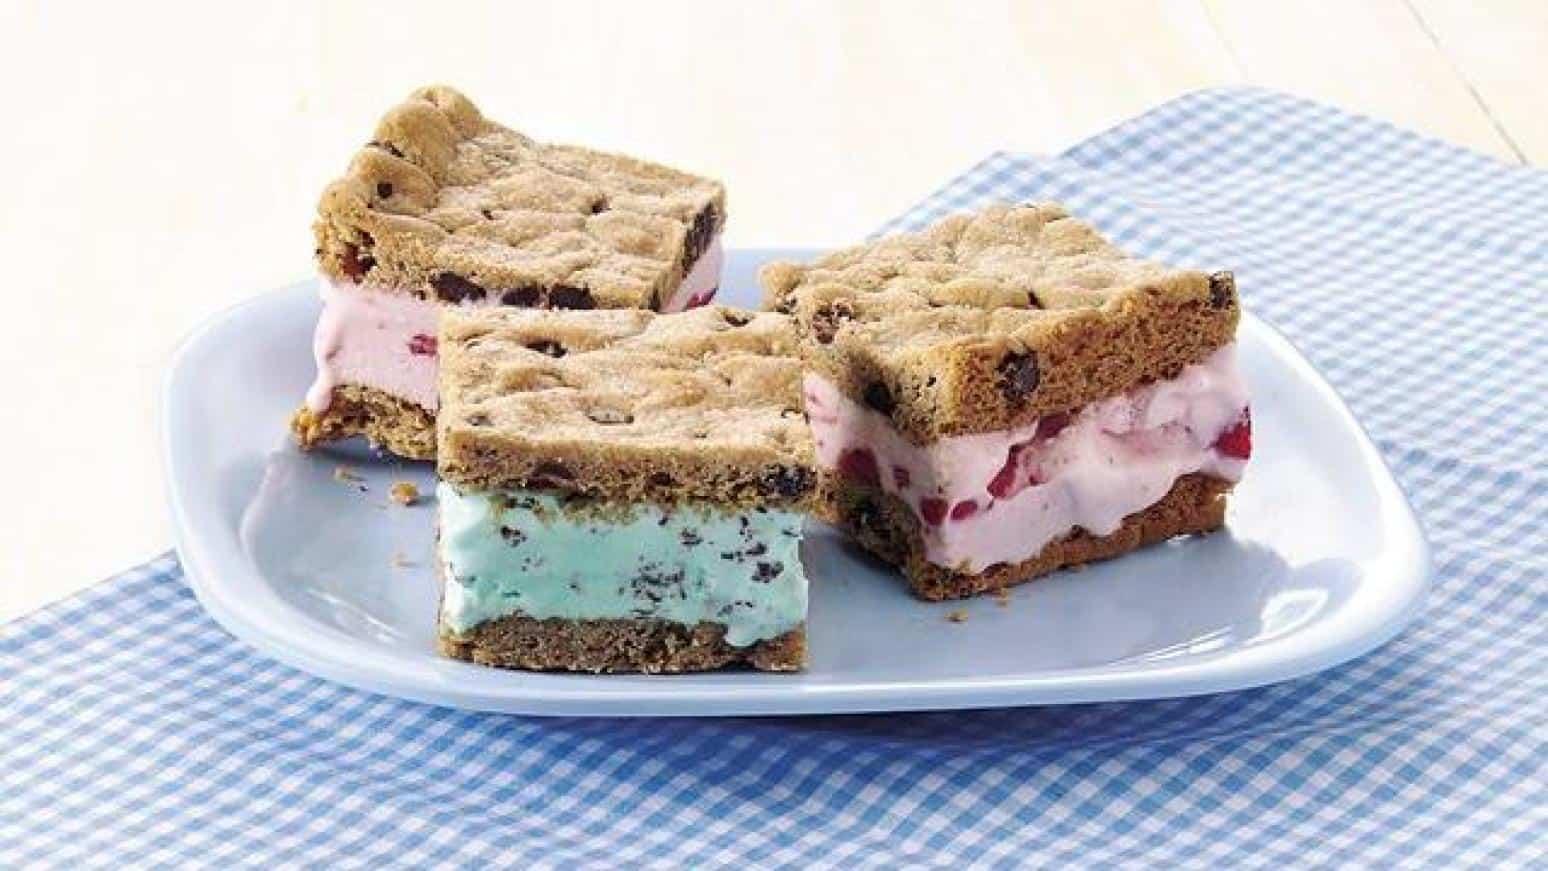 Flavoured ice cream sandwich bars